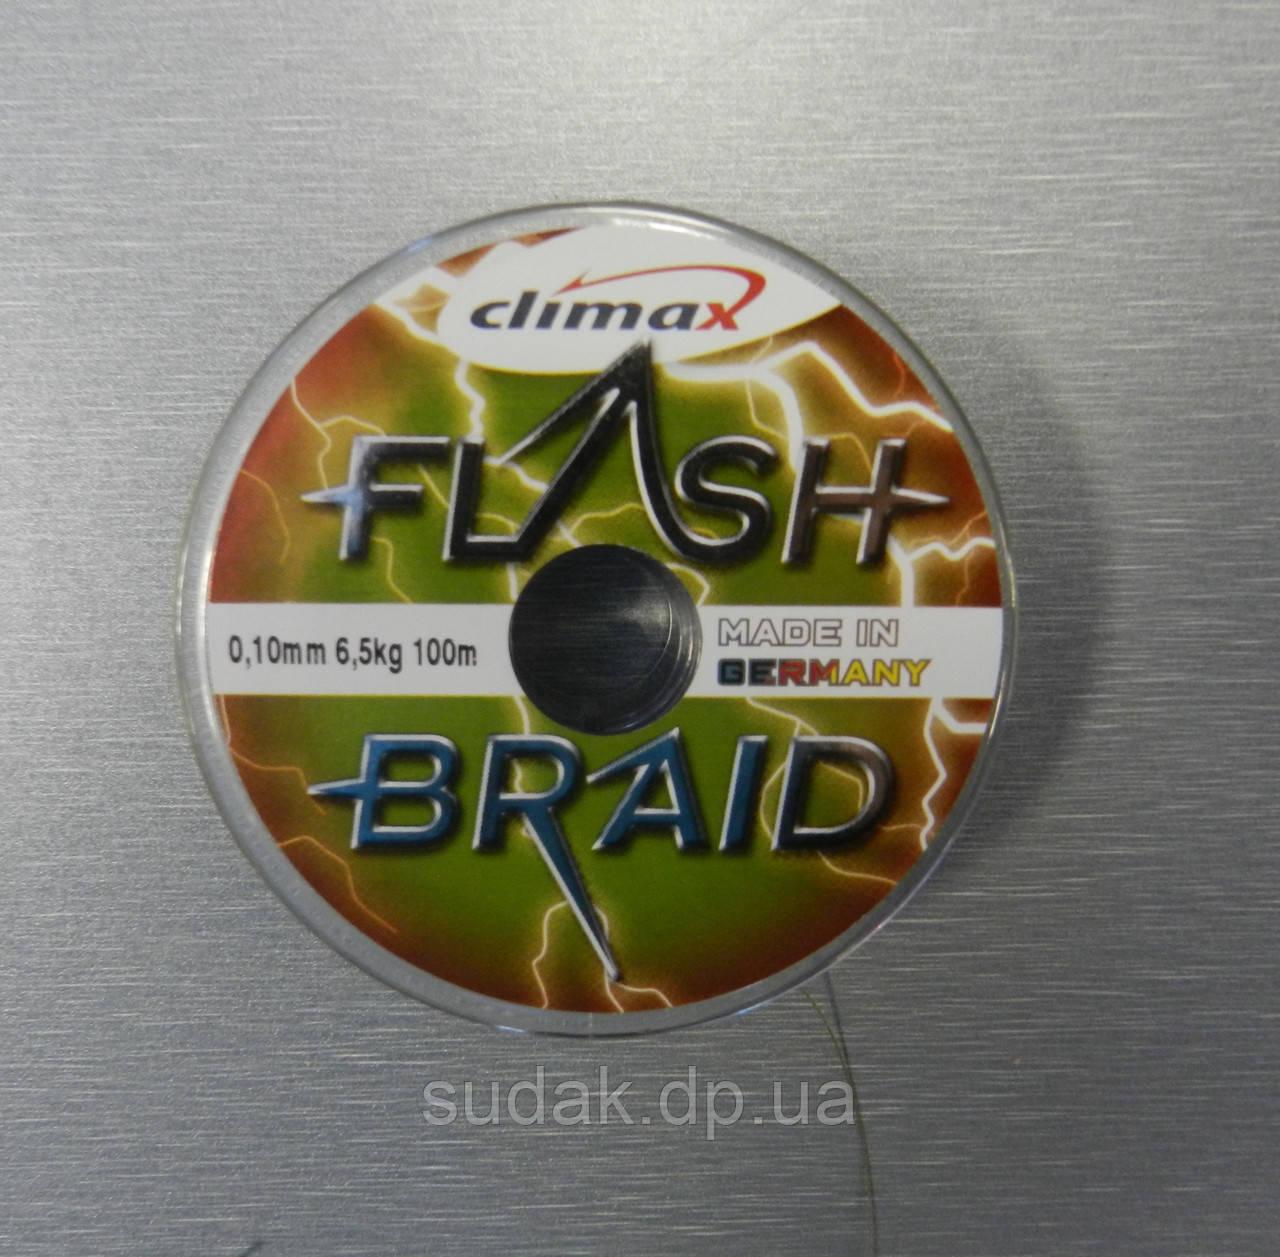 Шнур CLIMAX FLASH BRAID Yellow 100 m 0.10 6.50kg, желтый